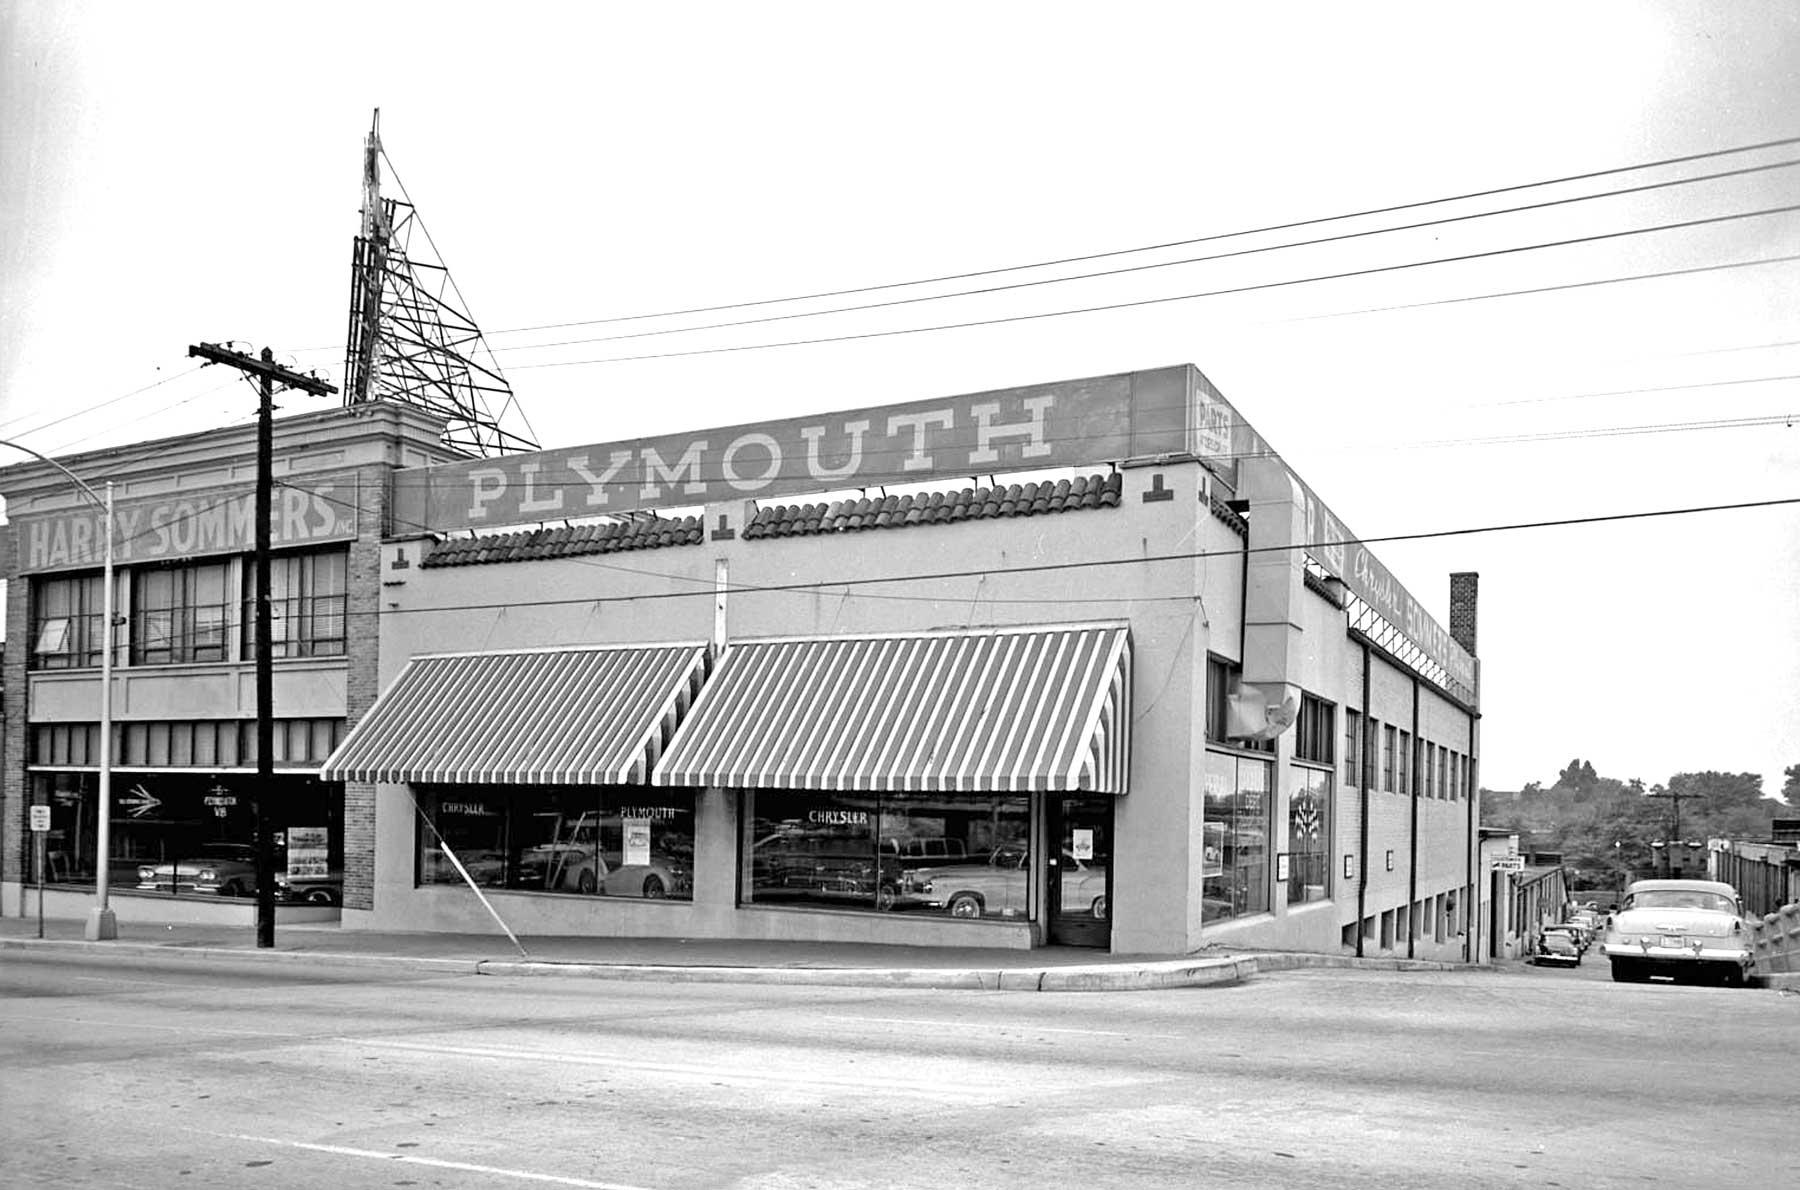 Harry Sommers Chrysler Plymouth Atlanta Georgia The Old Motor